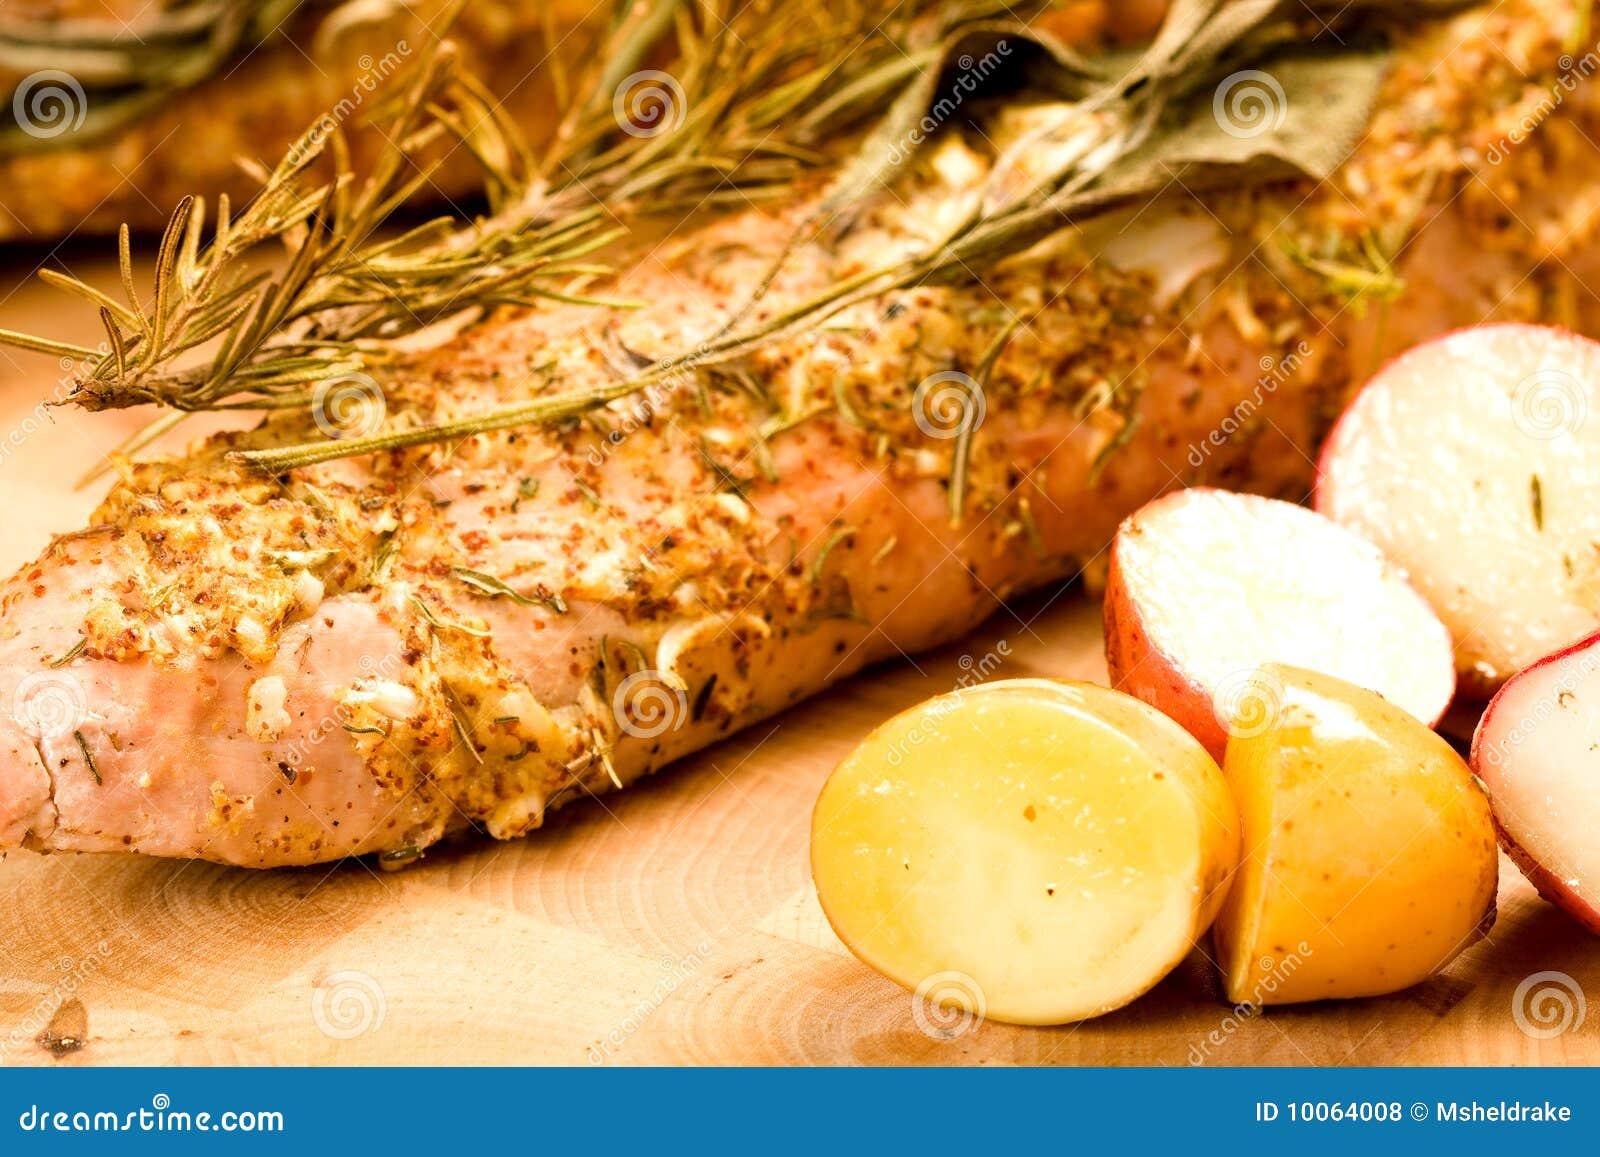 Download Whole Pork Tenderloin stock photo. Image of coat, twigs - 10064008